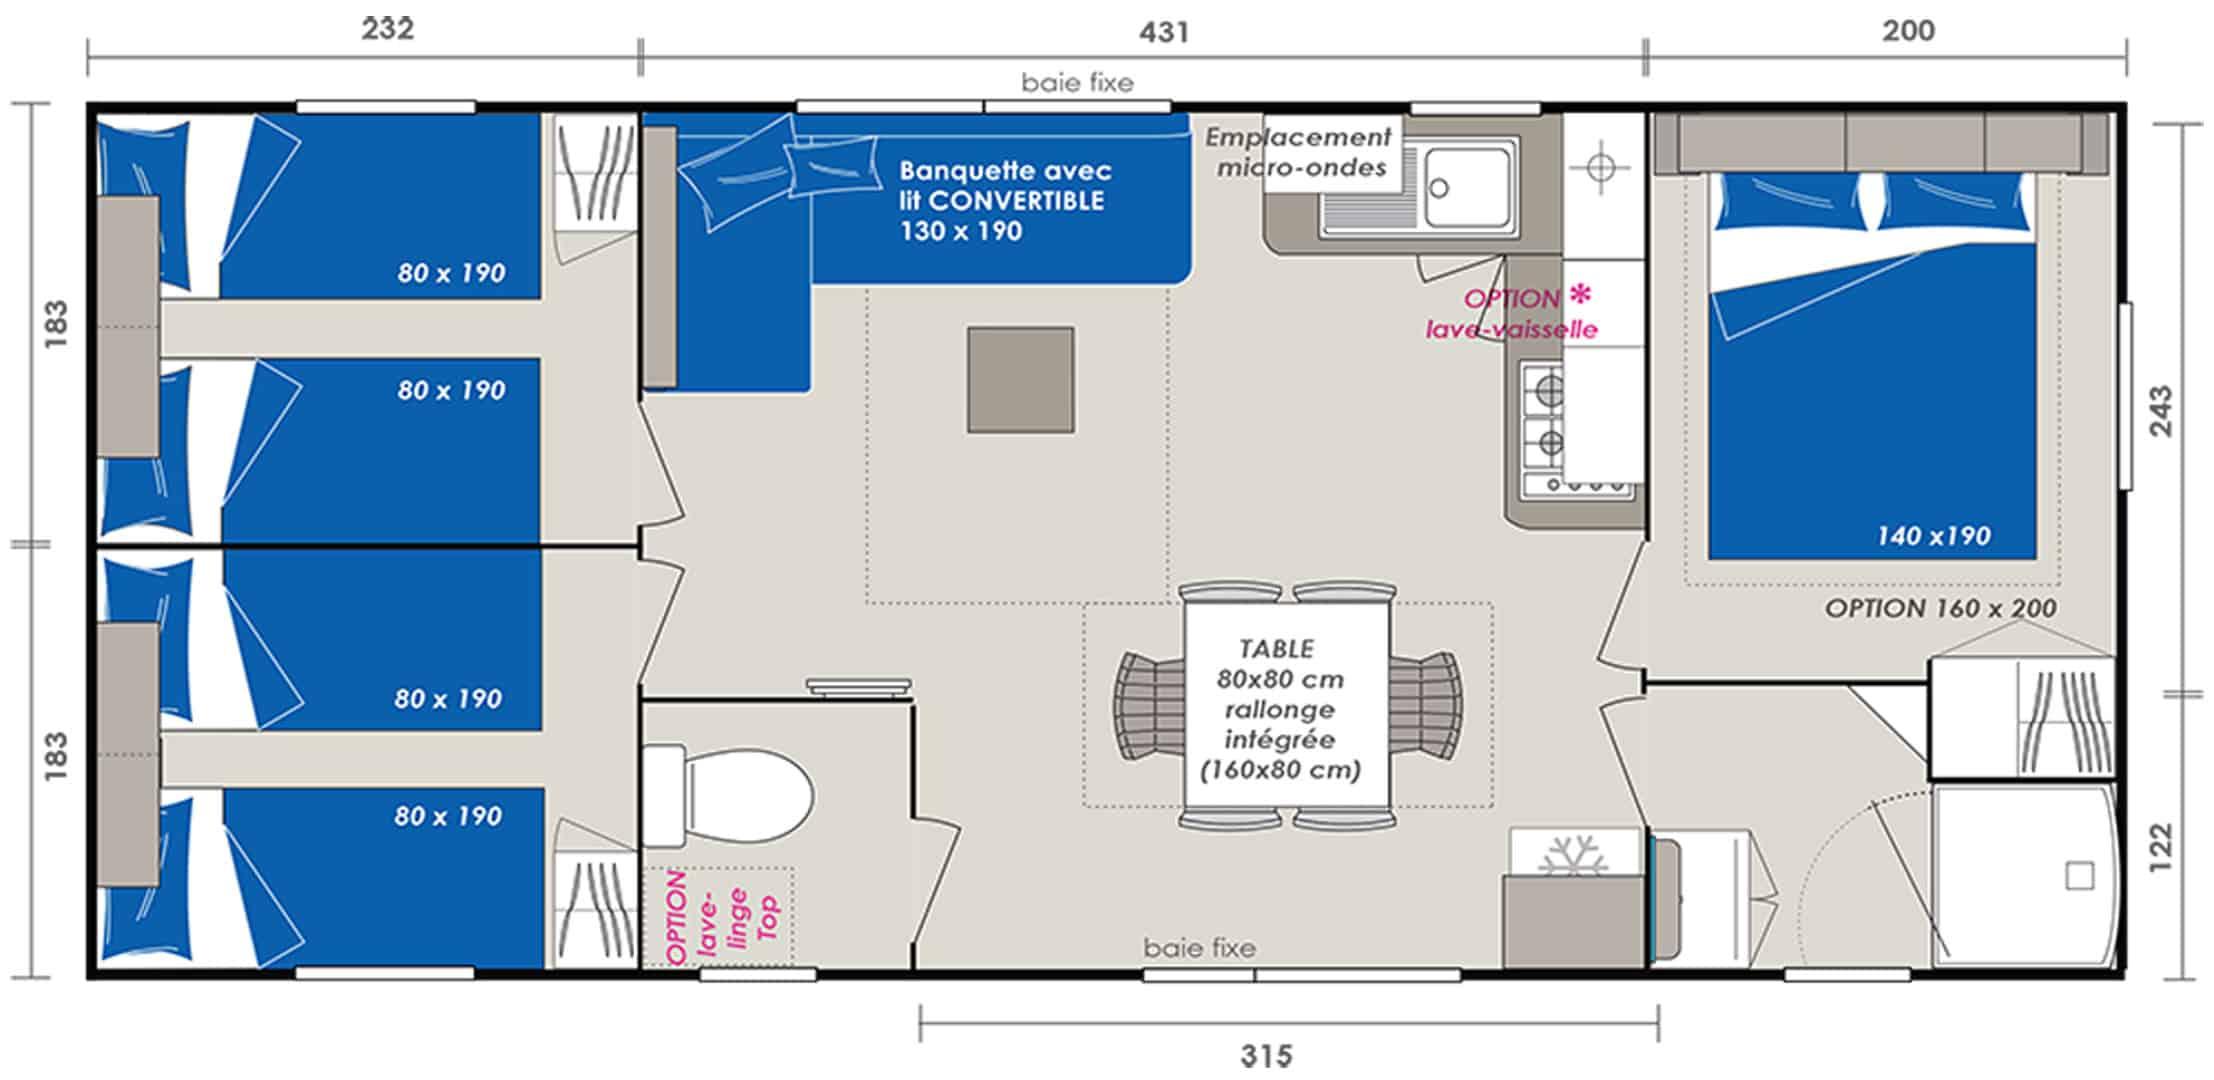 Location Mobilhome 3ch 6/8 personnes : Plan du mobilhome